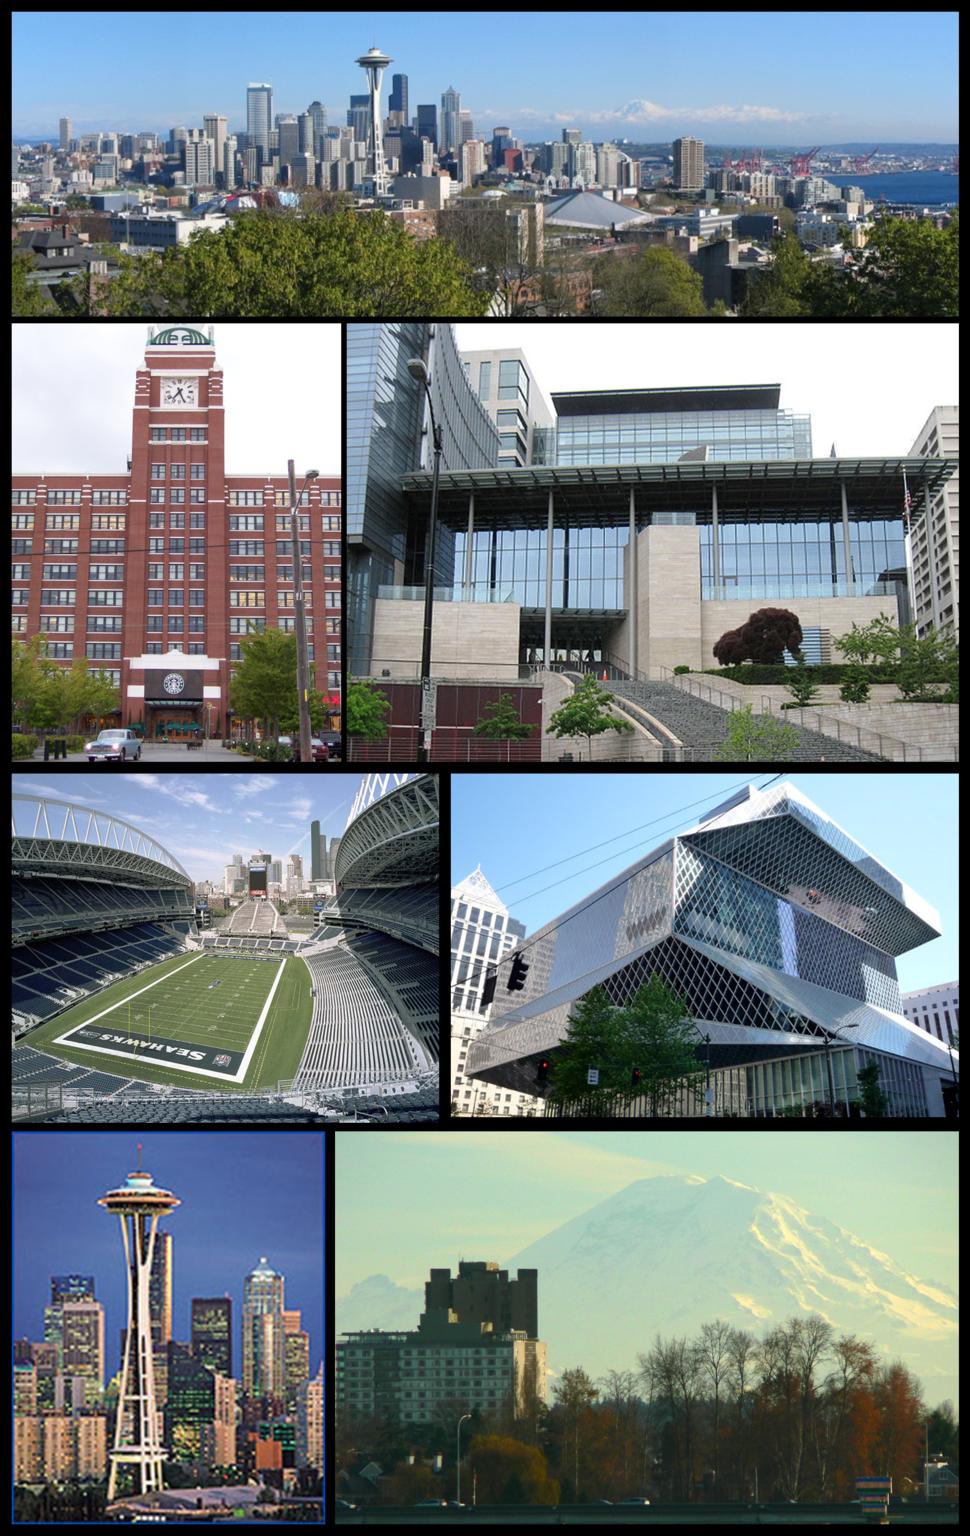 SeattleMontage